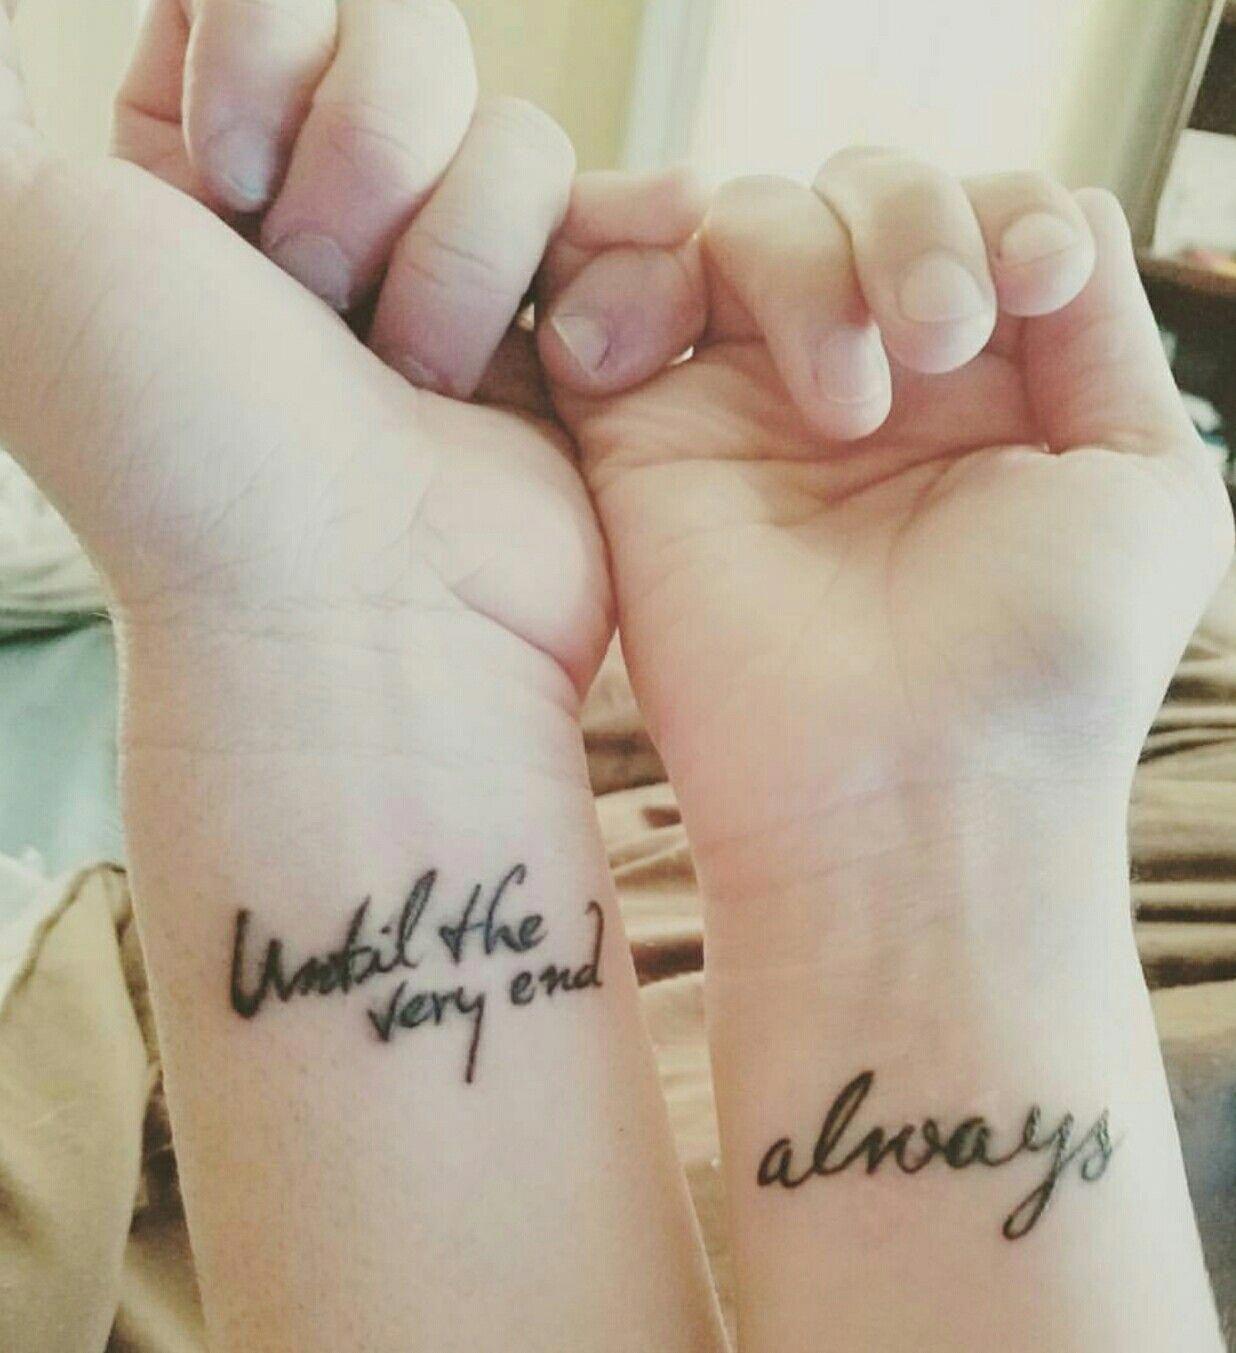 9 17 16 My 4th Tattoo Harry Potter Couples Tattoo Coupletattoos Harry Potter Couples Harry Potter Tattoo Small Harry Potter Tattoos